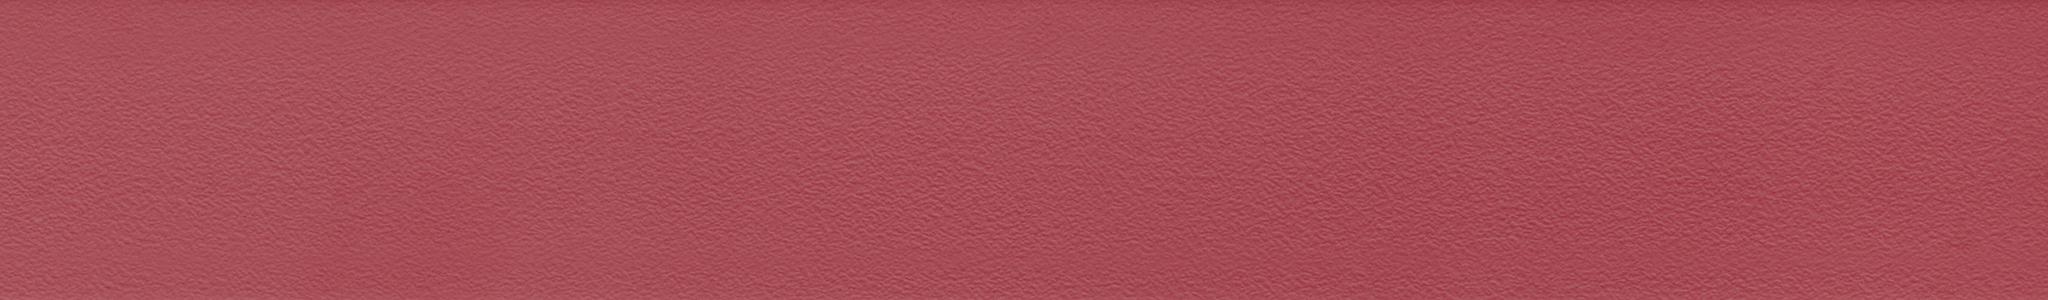 HU 137008 ABS Edge Ruby Red Perl XG